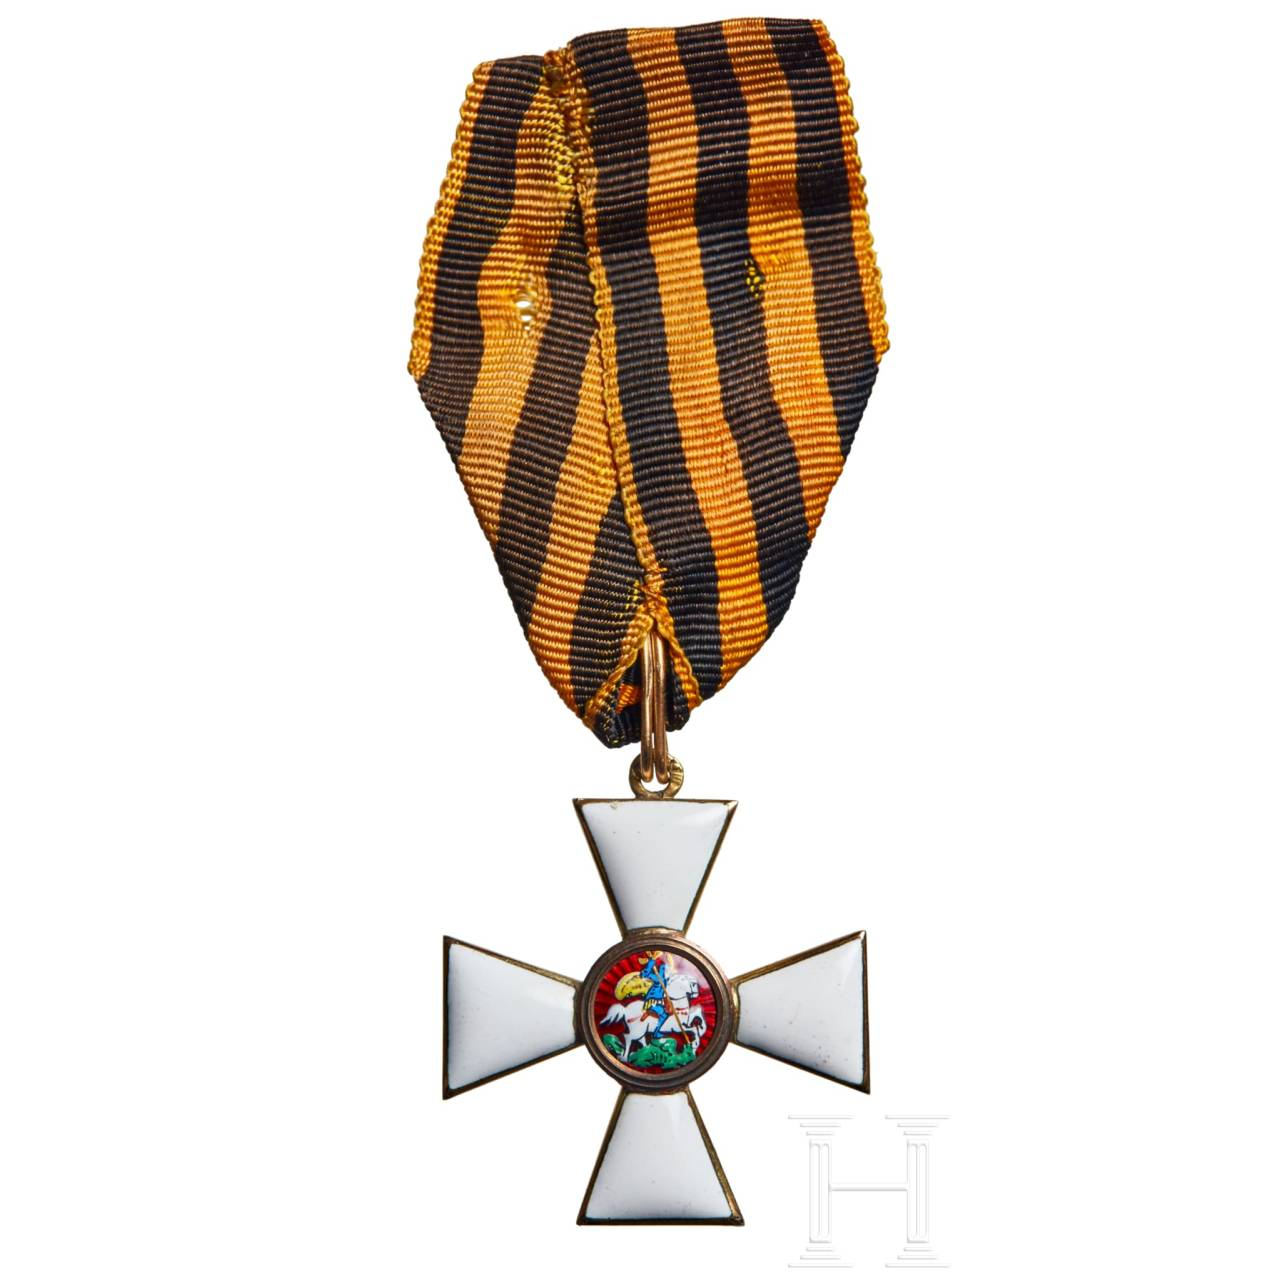 A russian St. George Order, 4th class cross, circa 1900